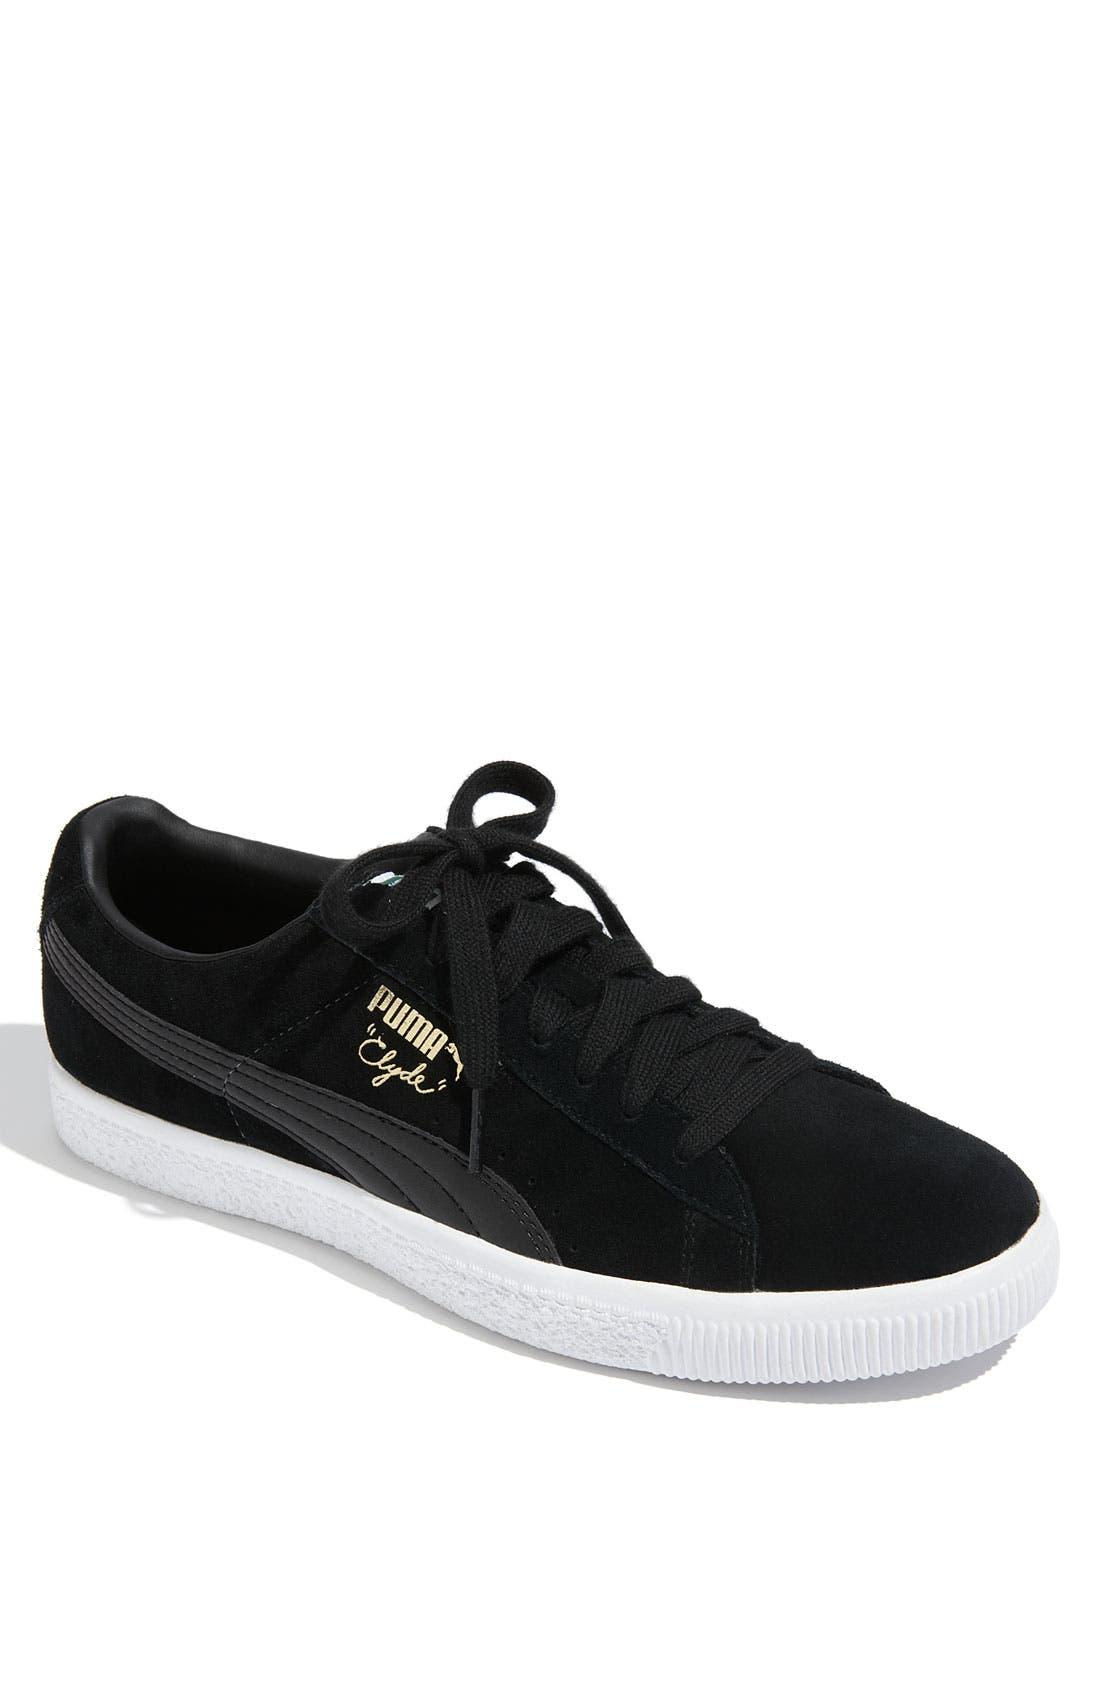 Main Image - PUMA 'Clyde Script' Sneaker